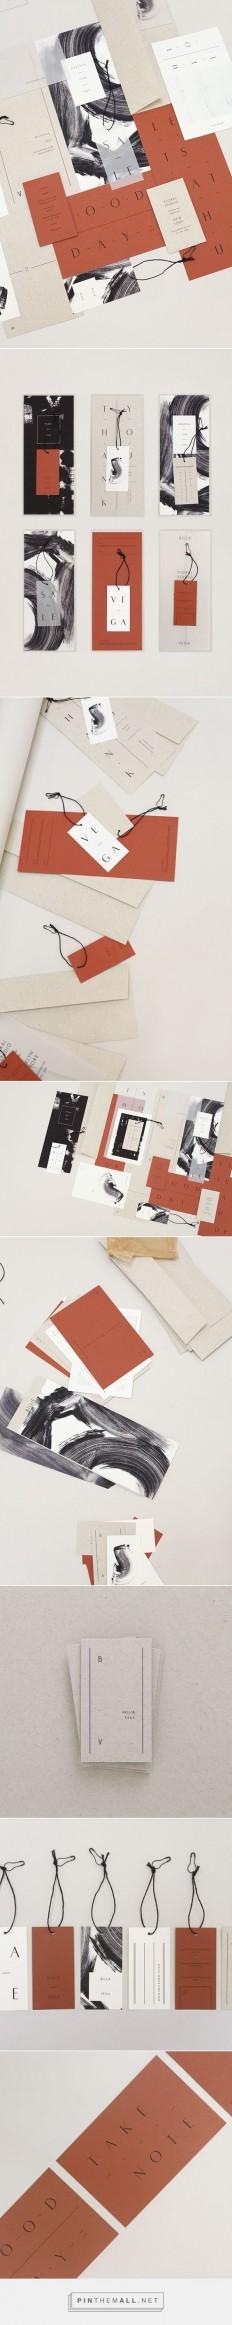 Billie Collection by Hands-on   Logo Designer Bradenton, Web Design Sarasota, Tampa Fivestar Branding Agency